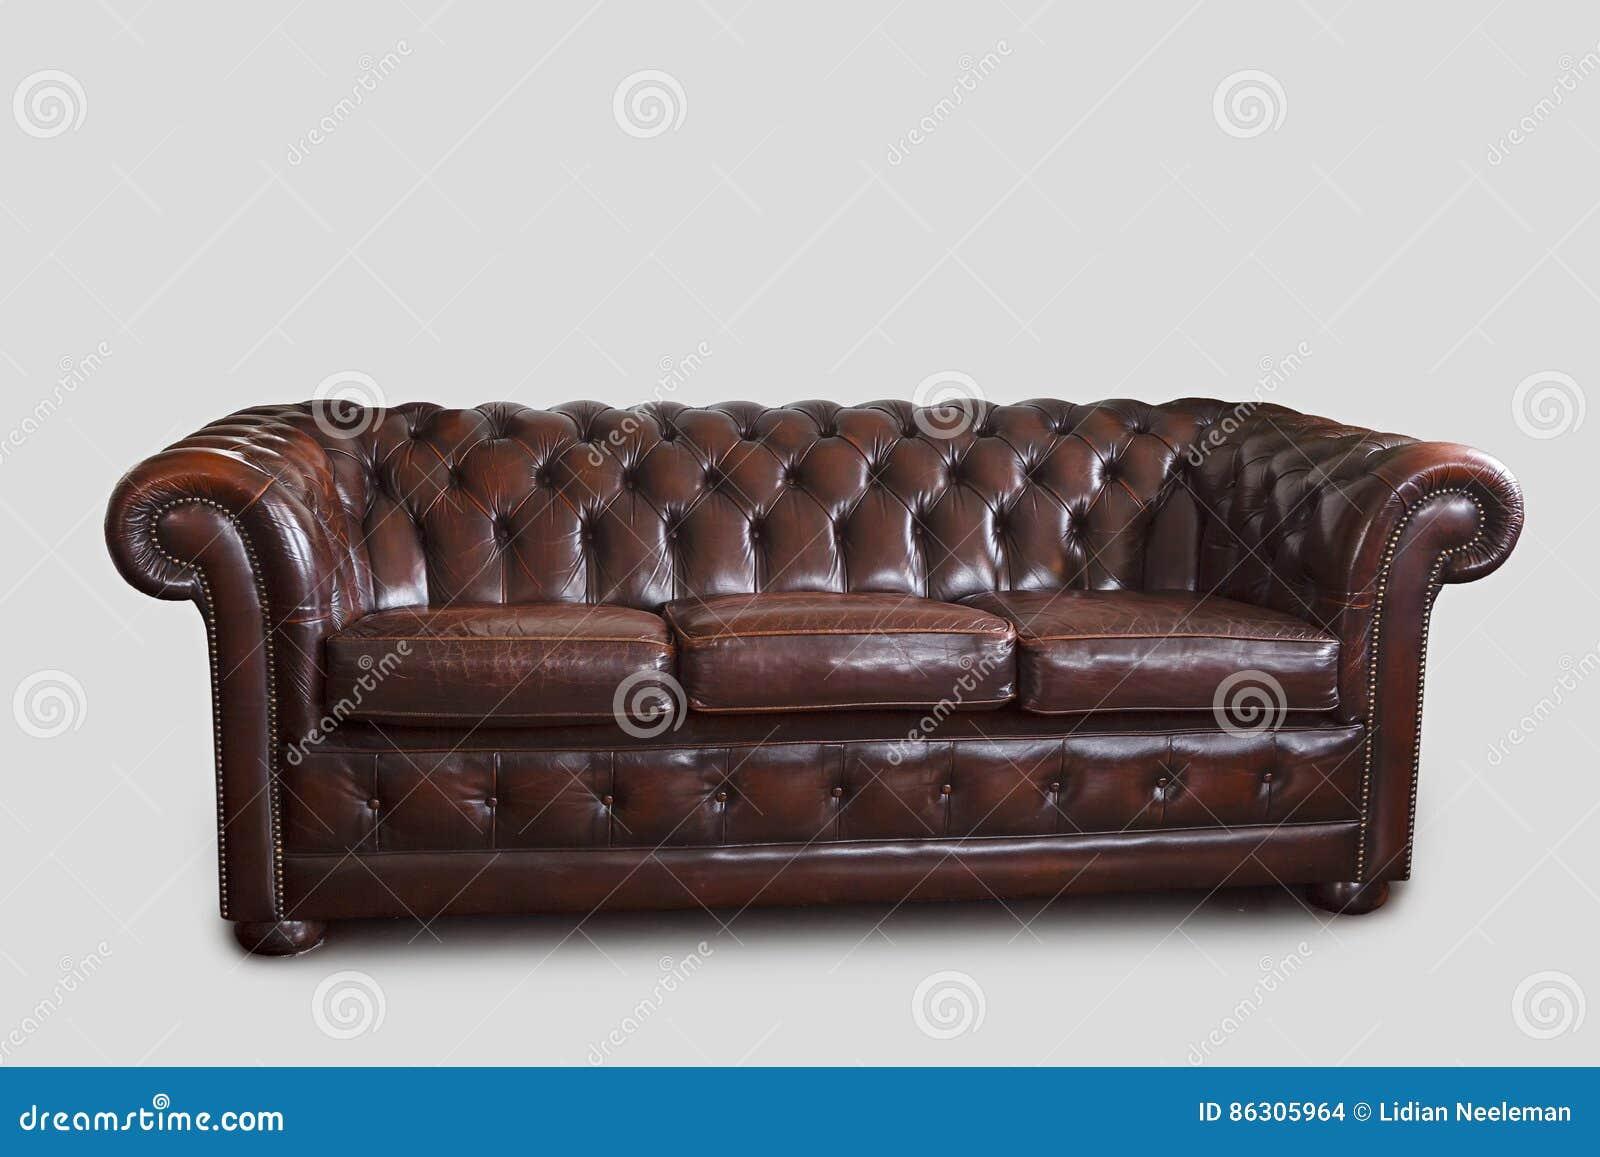 Chesterfield Sofa On White Stock Photo Image Of Retro 86305964